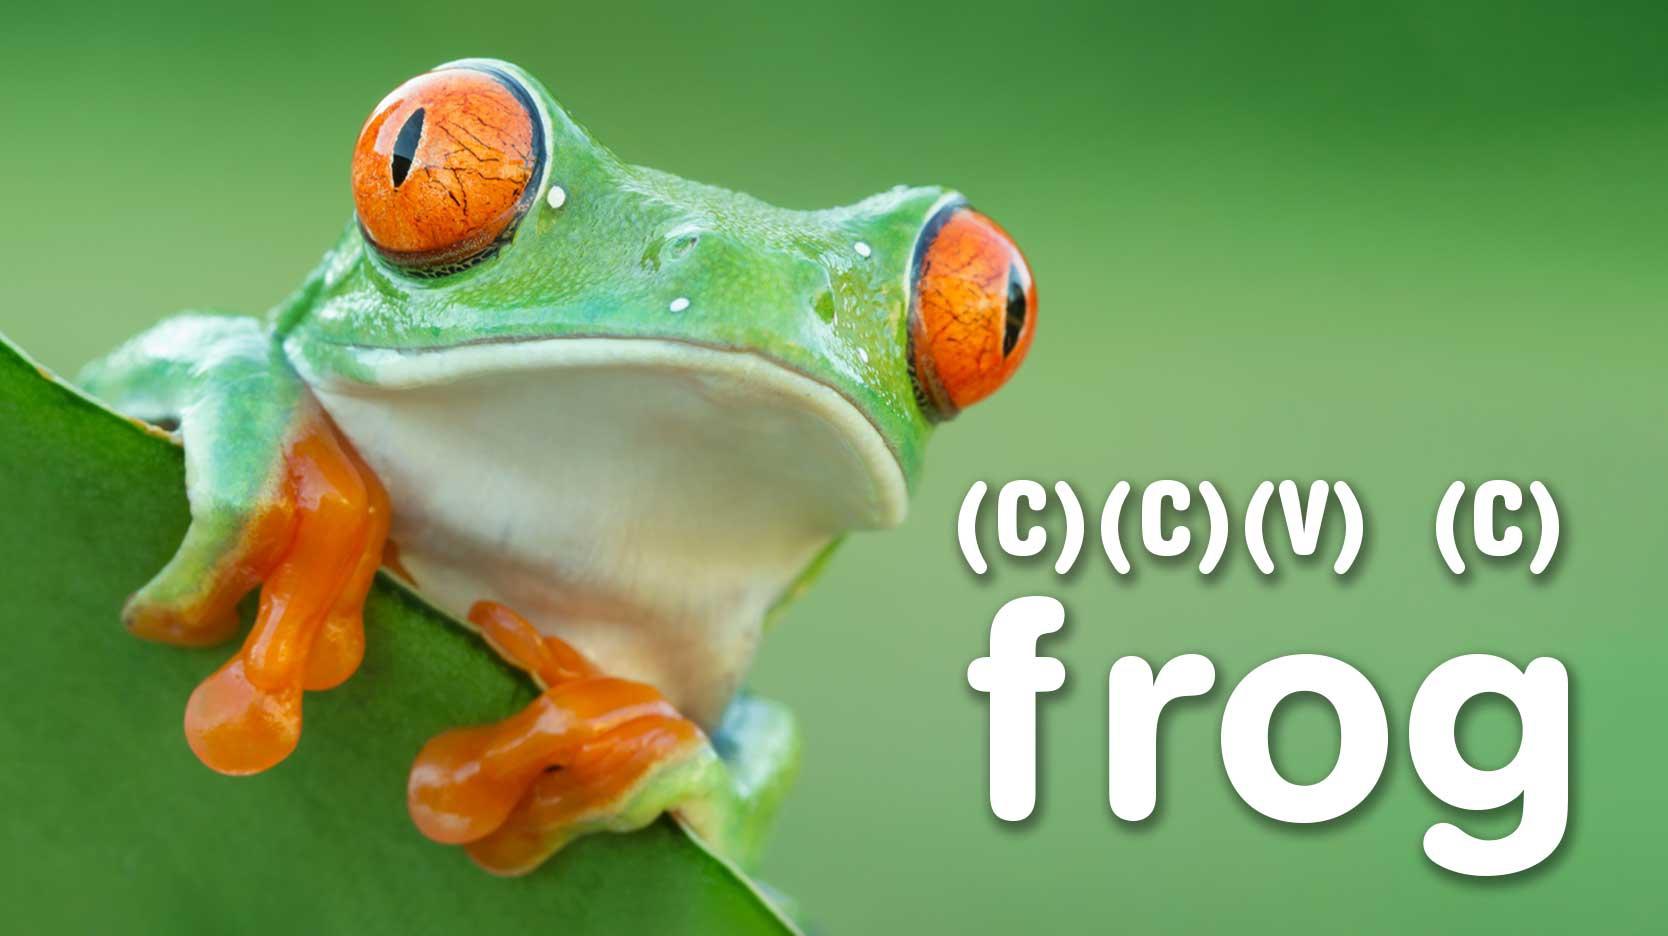 ccvc frog example